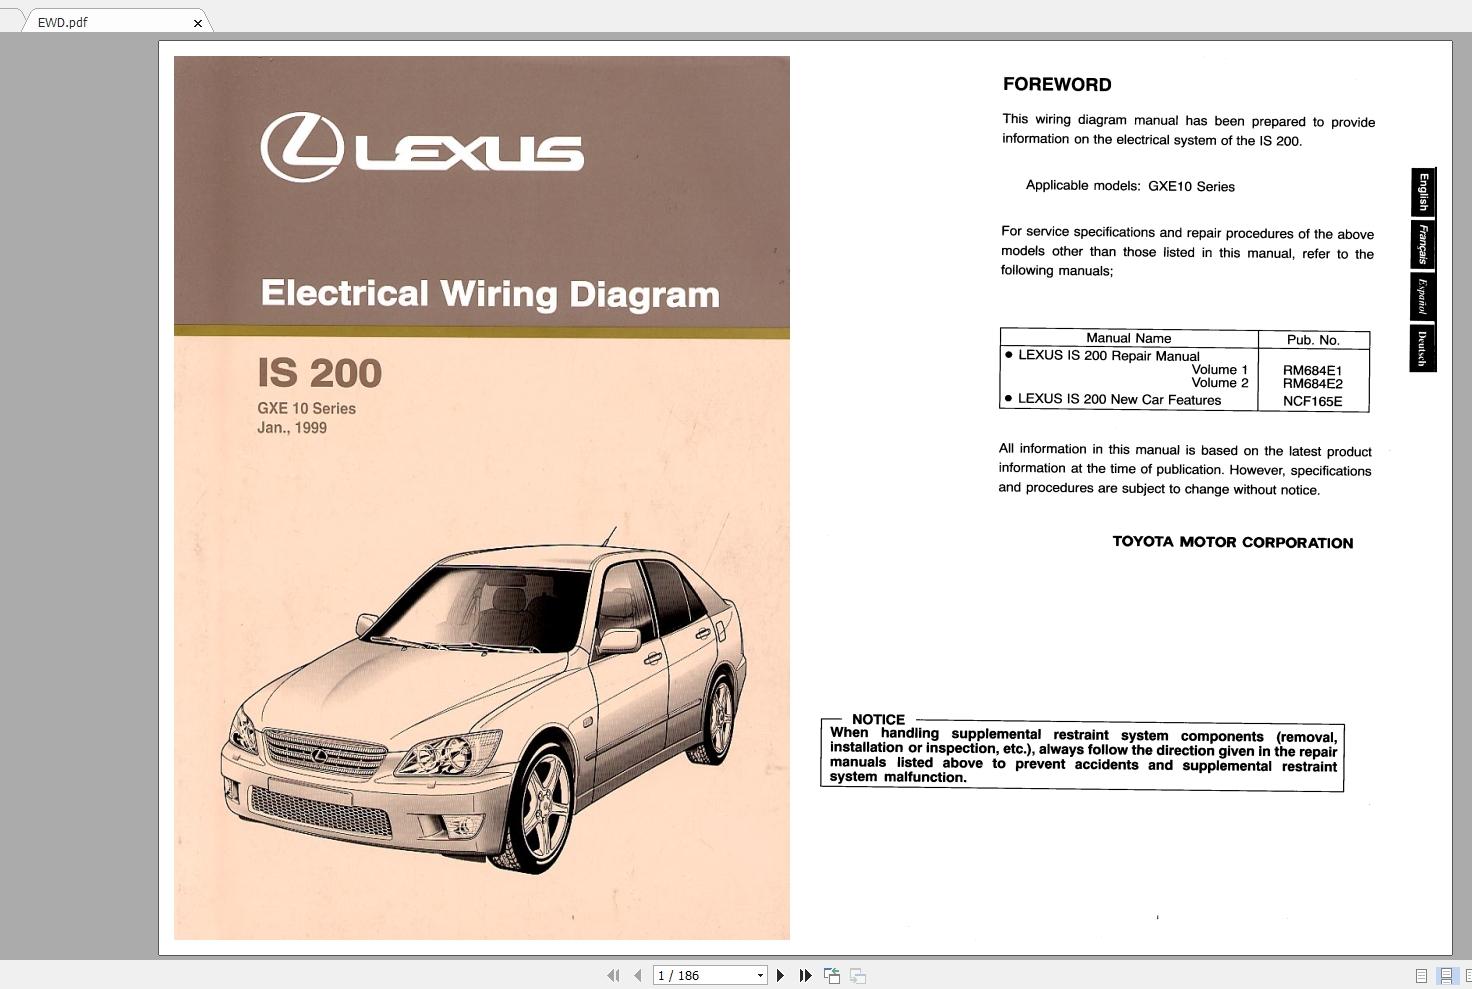 DIAGRAM] Lexus Is200 Wiring Diagrams Pdf FULL Version HD Quality Diagrams  Pdf - FINDIAGRAM.PRAGA-HAITI.FRPraga-Haiti